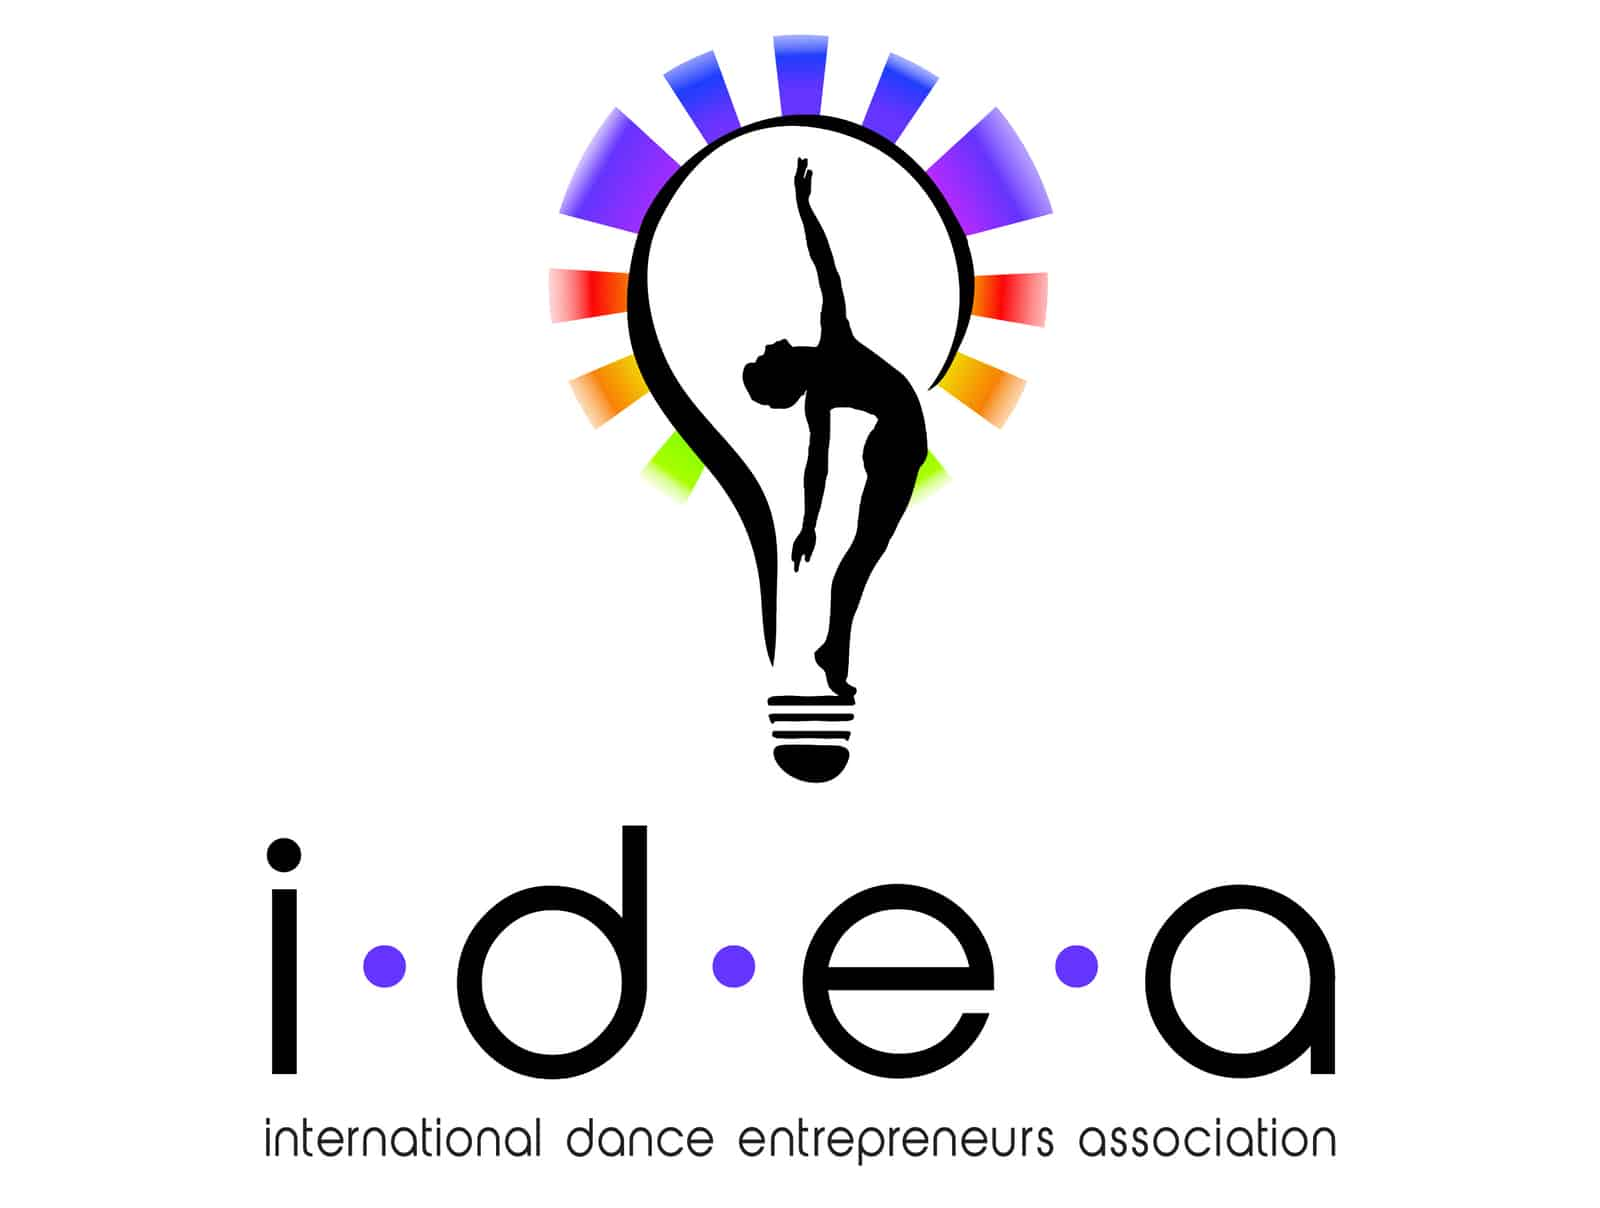 IDEA_5-26-16_3X3curvedhopup_endcaps_REV2